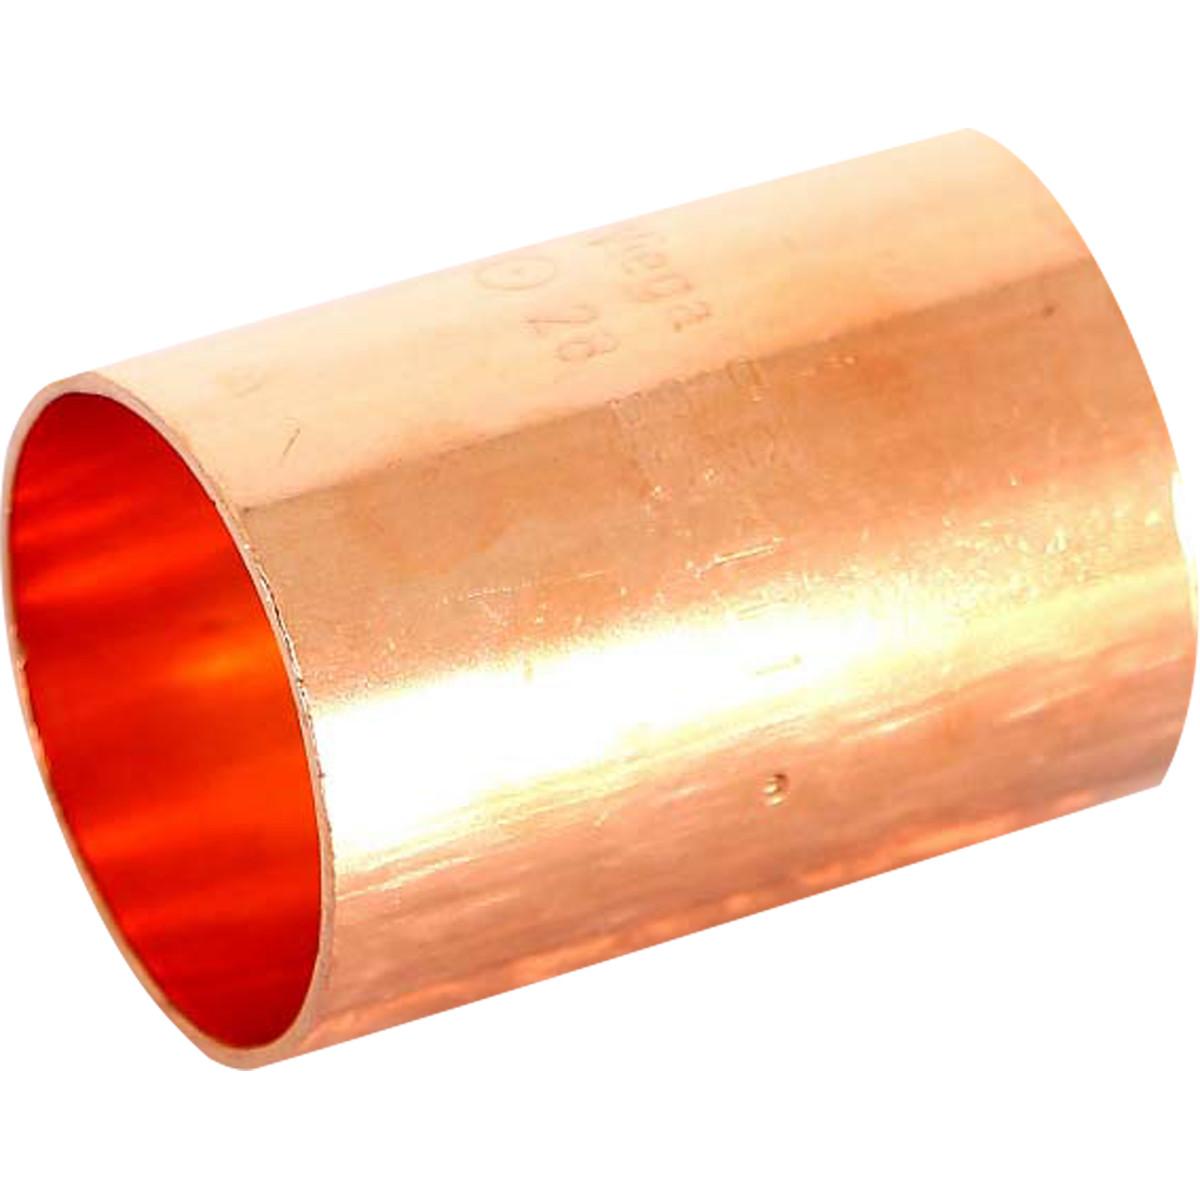 Муфта пайка Viega 28 мм медь